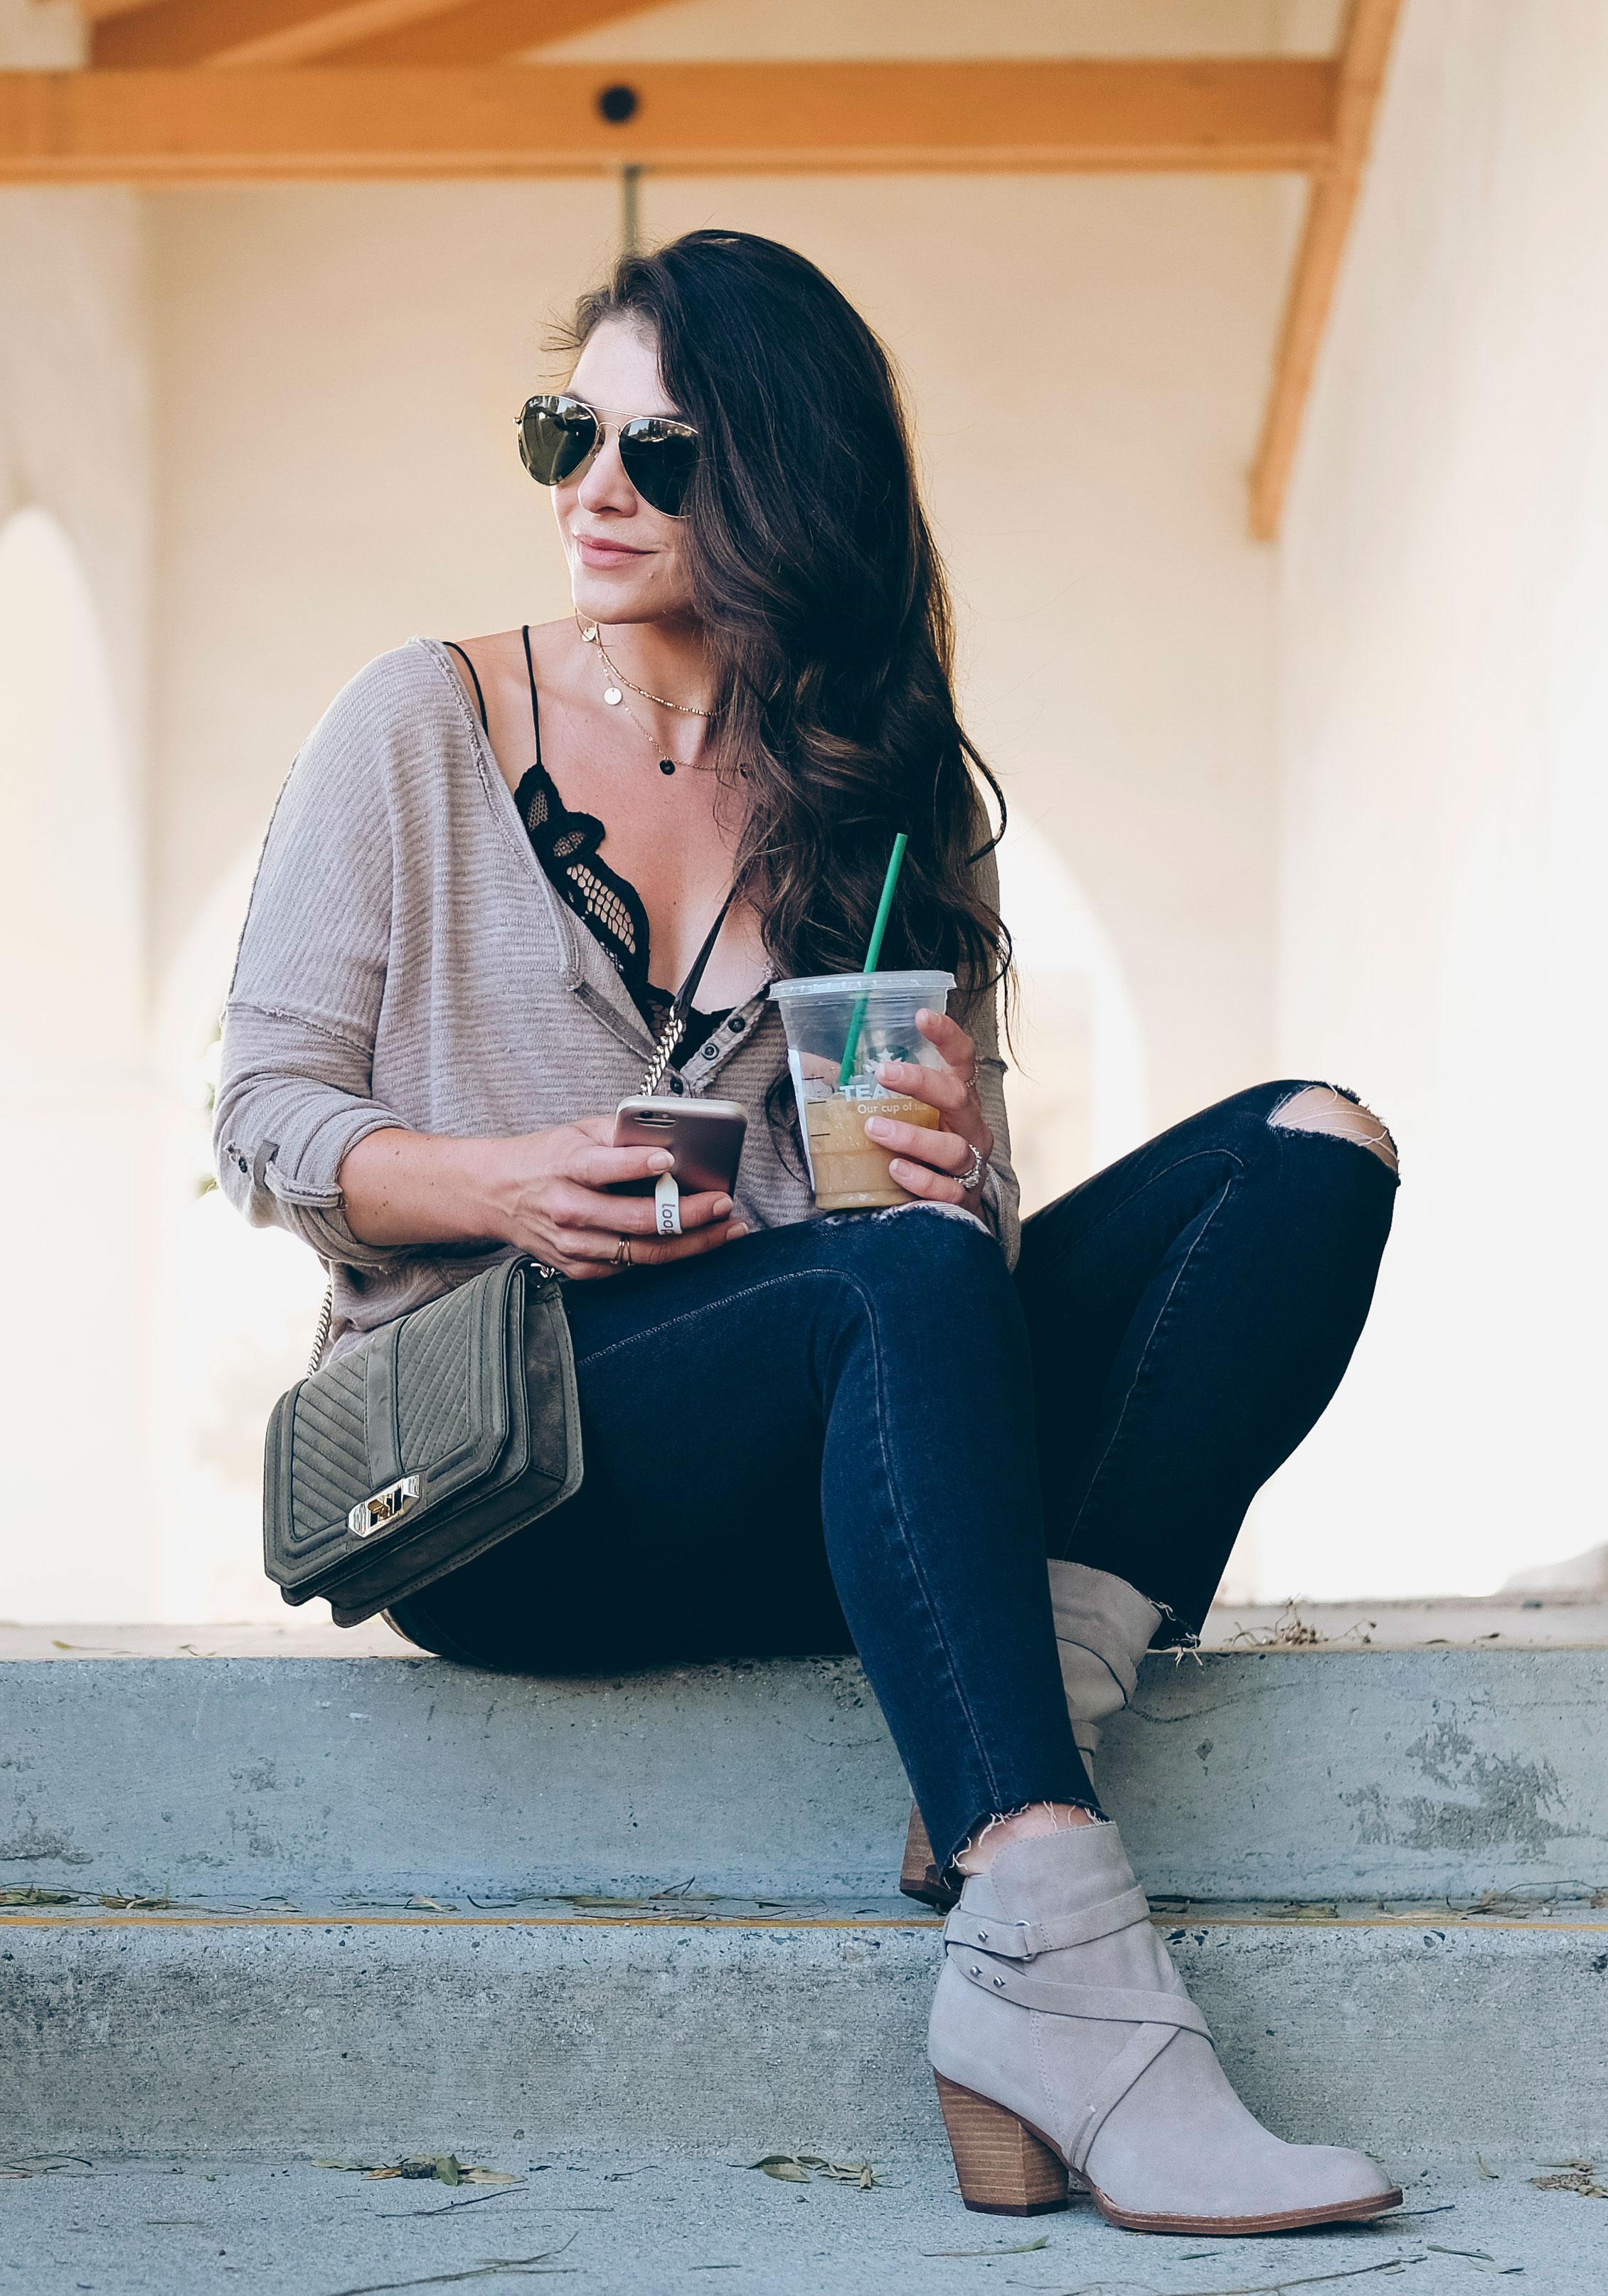 Nordstrom Anniversary Sale 2017.  Free People Beach Haven Tee, Madewell high rise ripped skinny jeans, Sam Edelman Merton booties, Rebecca Minkoff nubuck suede Love crossbody bag.